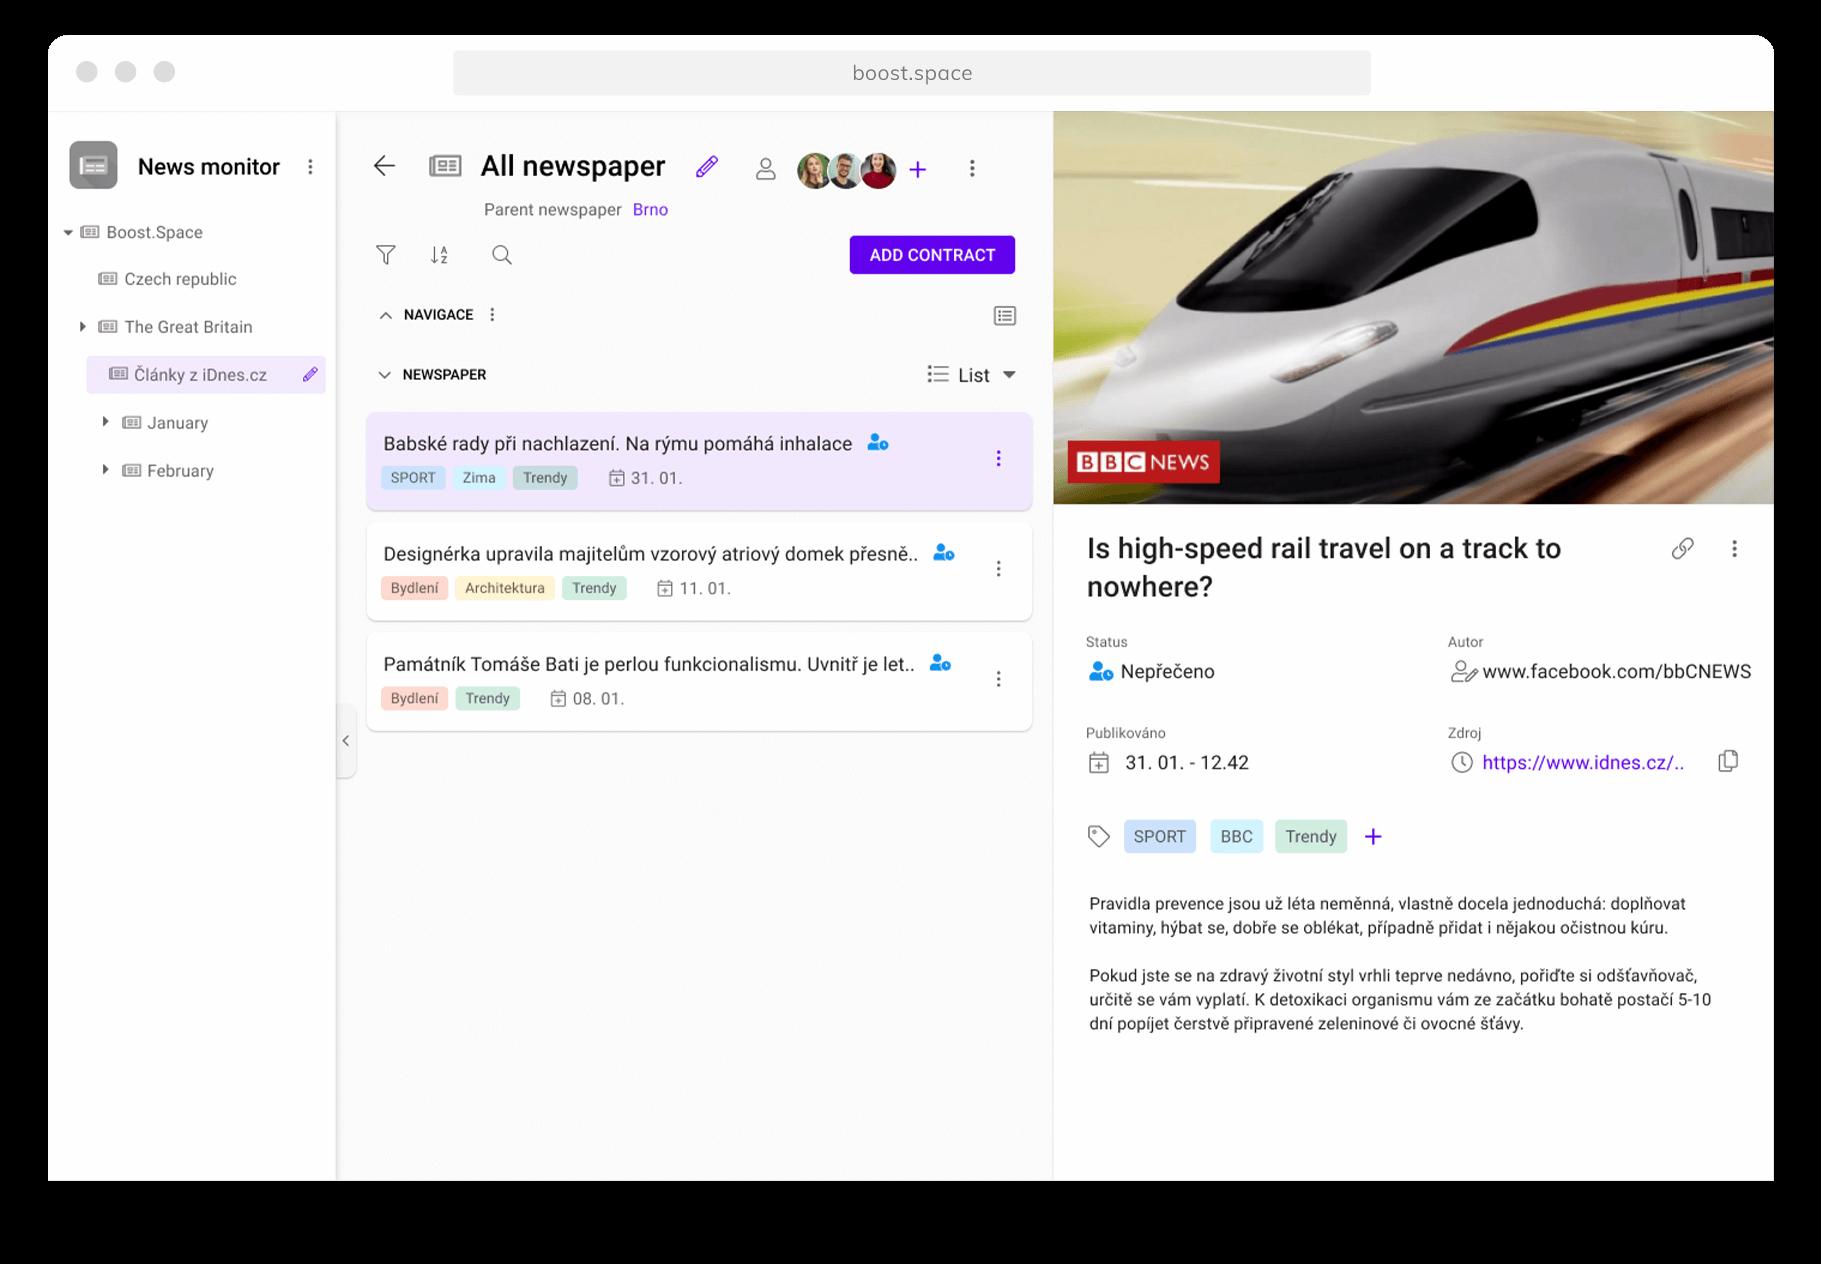 Screenshot of the module News monitor